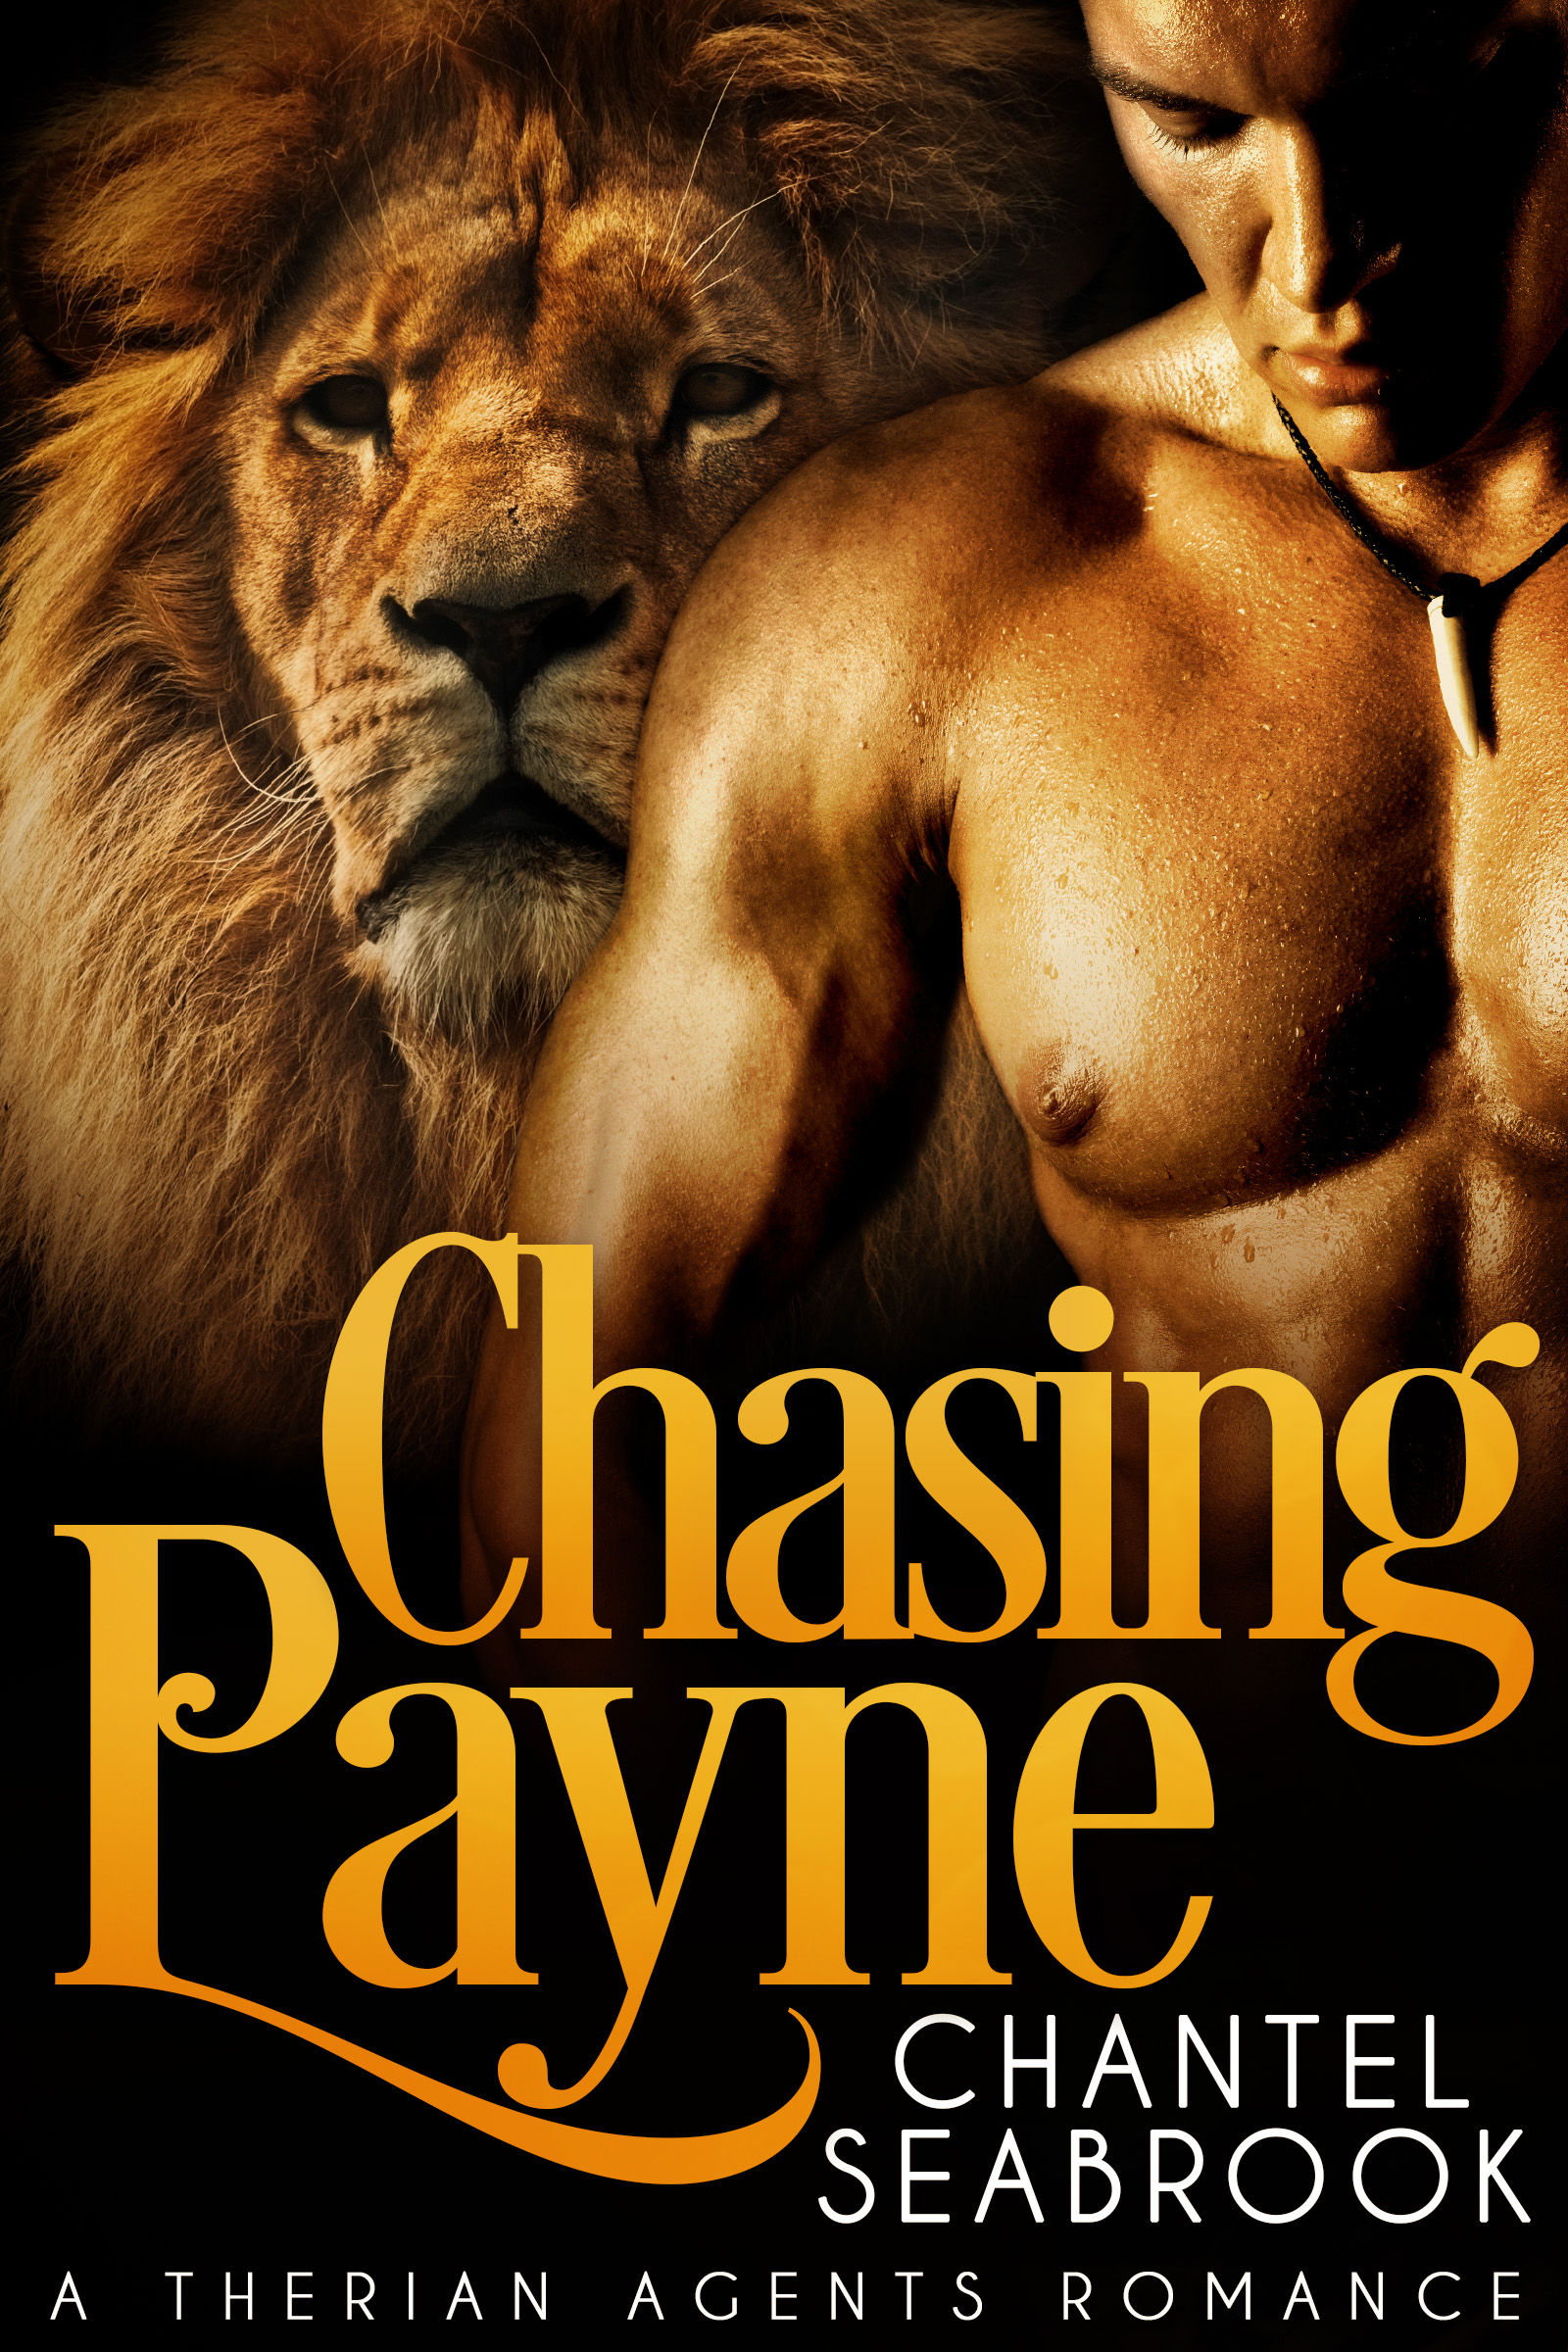 Chasing payne (n/a)